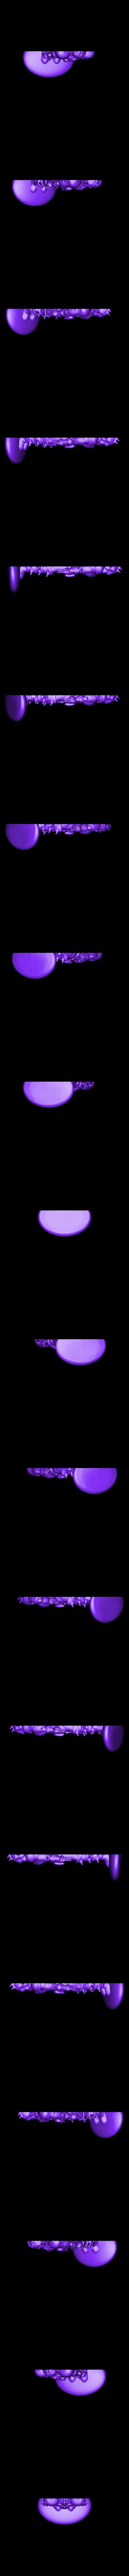 taureau 1.stl Download OBJ file 10 Intergalactic Humanoids • 3D print object, Majin59